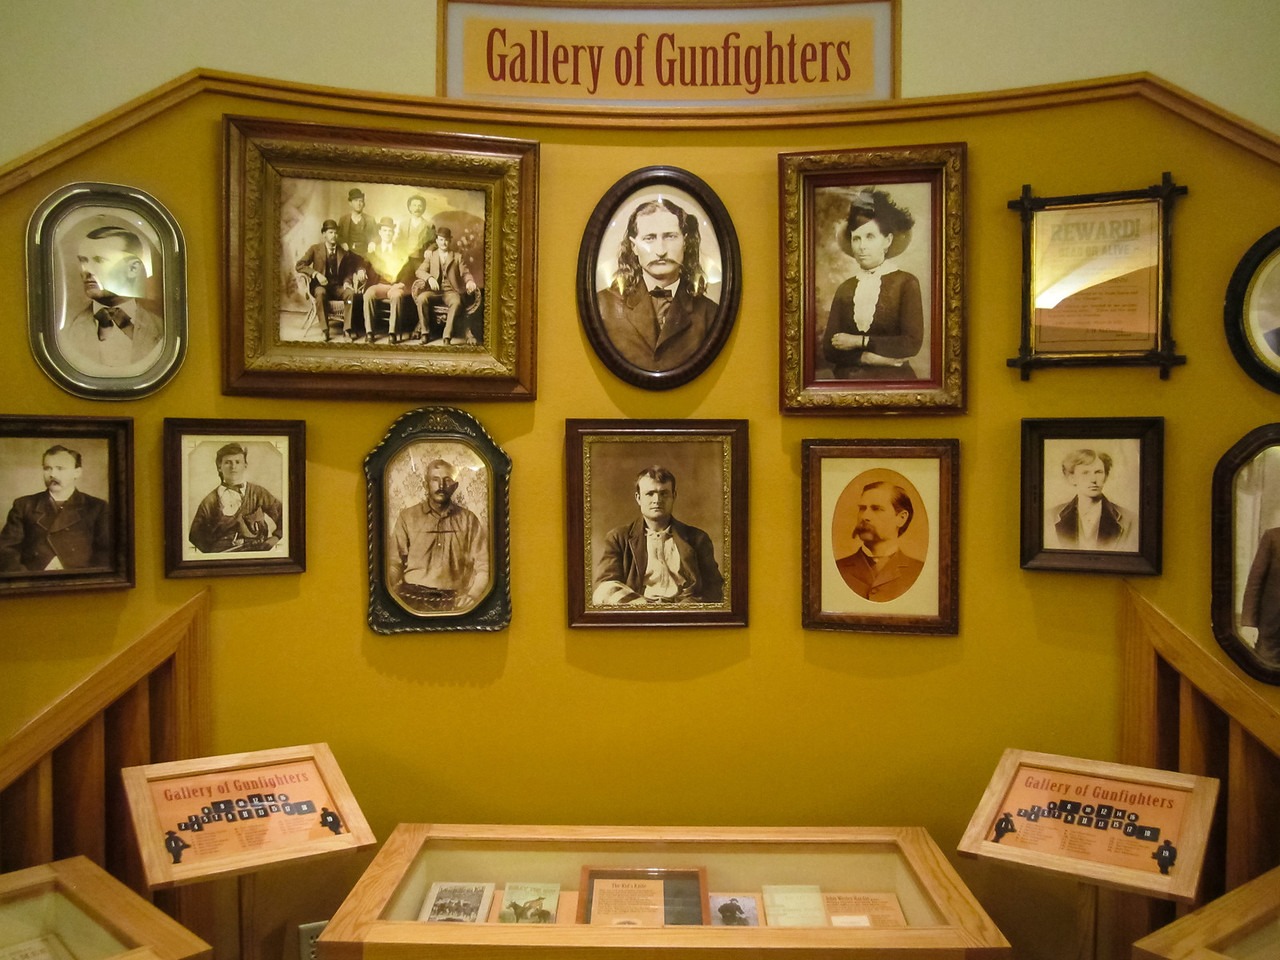 Gallery of Gunfighters, Buffalo Bill Historical Center